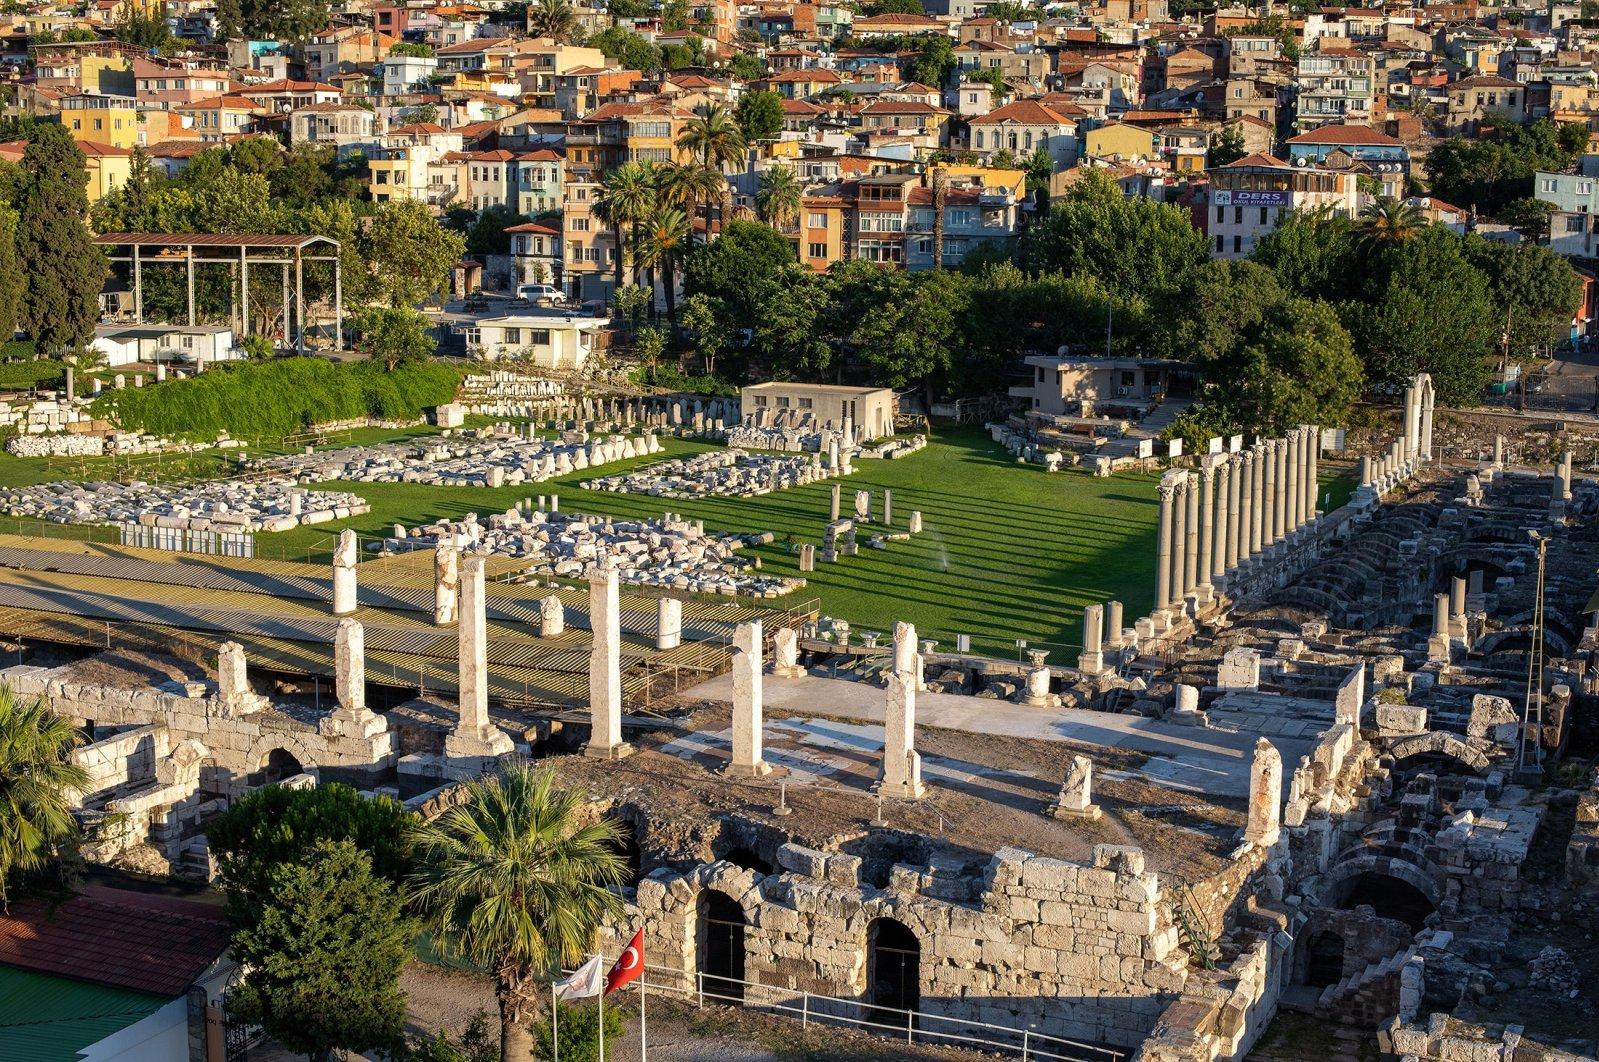 The Schumann Quartet will perform at Agora of Smyrna, alternatively known as the Agora of Izmir. (Shutterstock Photo)